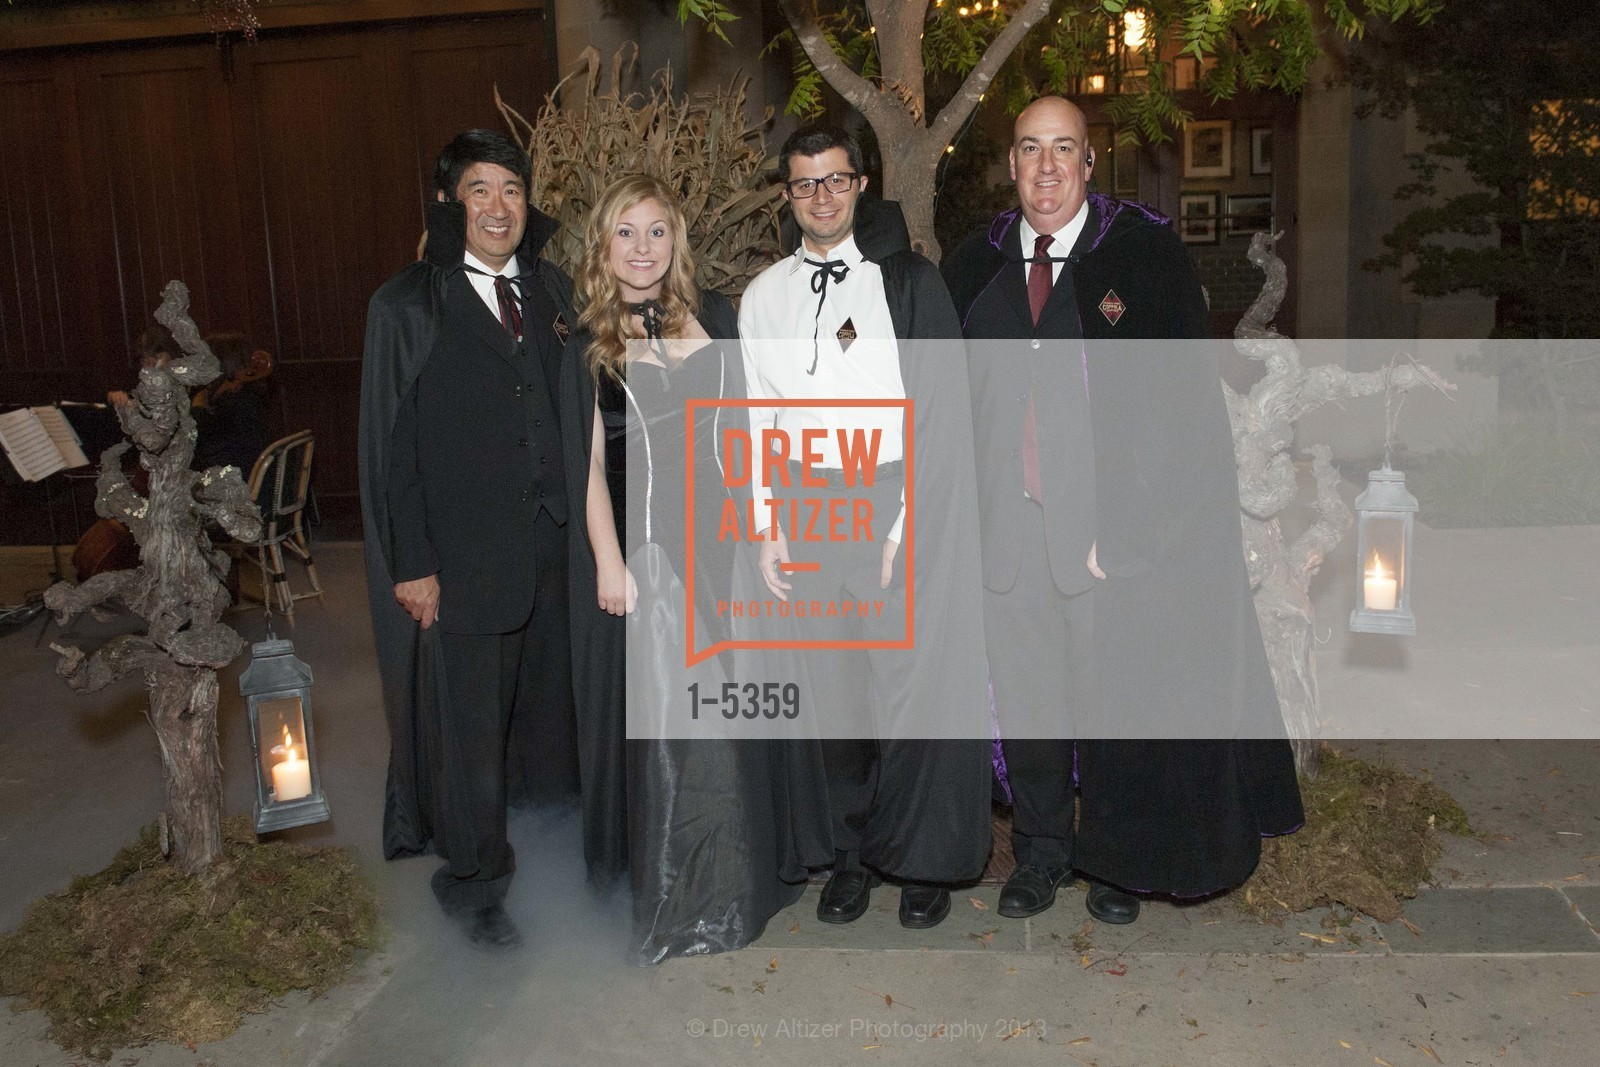 Rick Toyota, Rose Thorsson, Nick Agius, James Luchini, Photo #1-5359